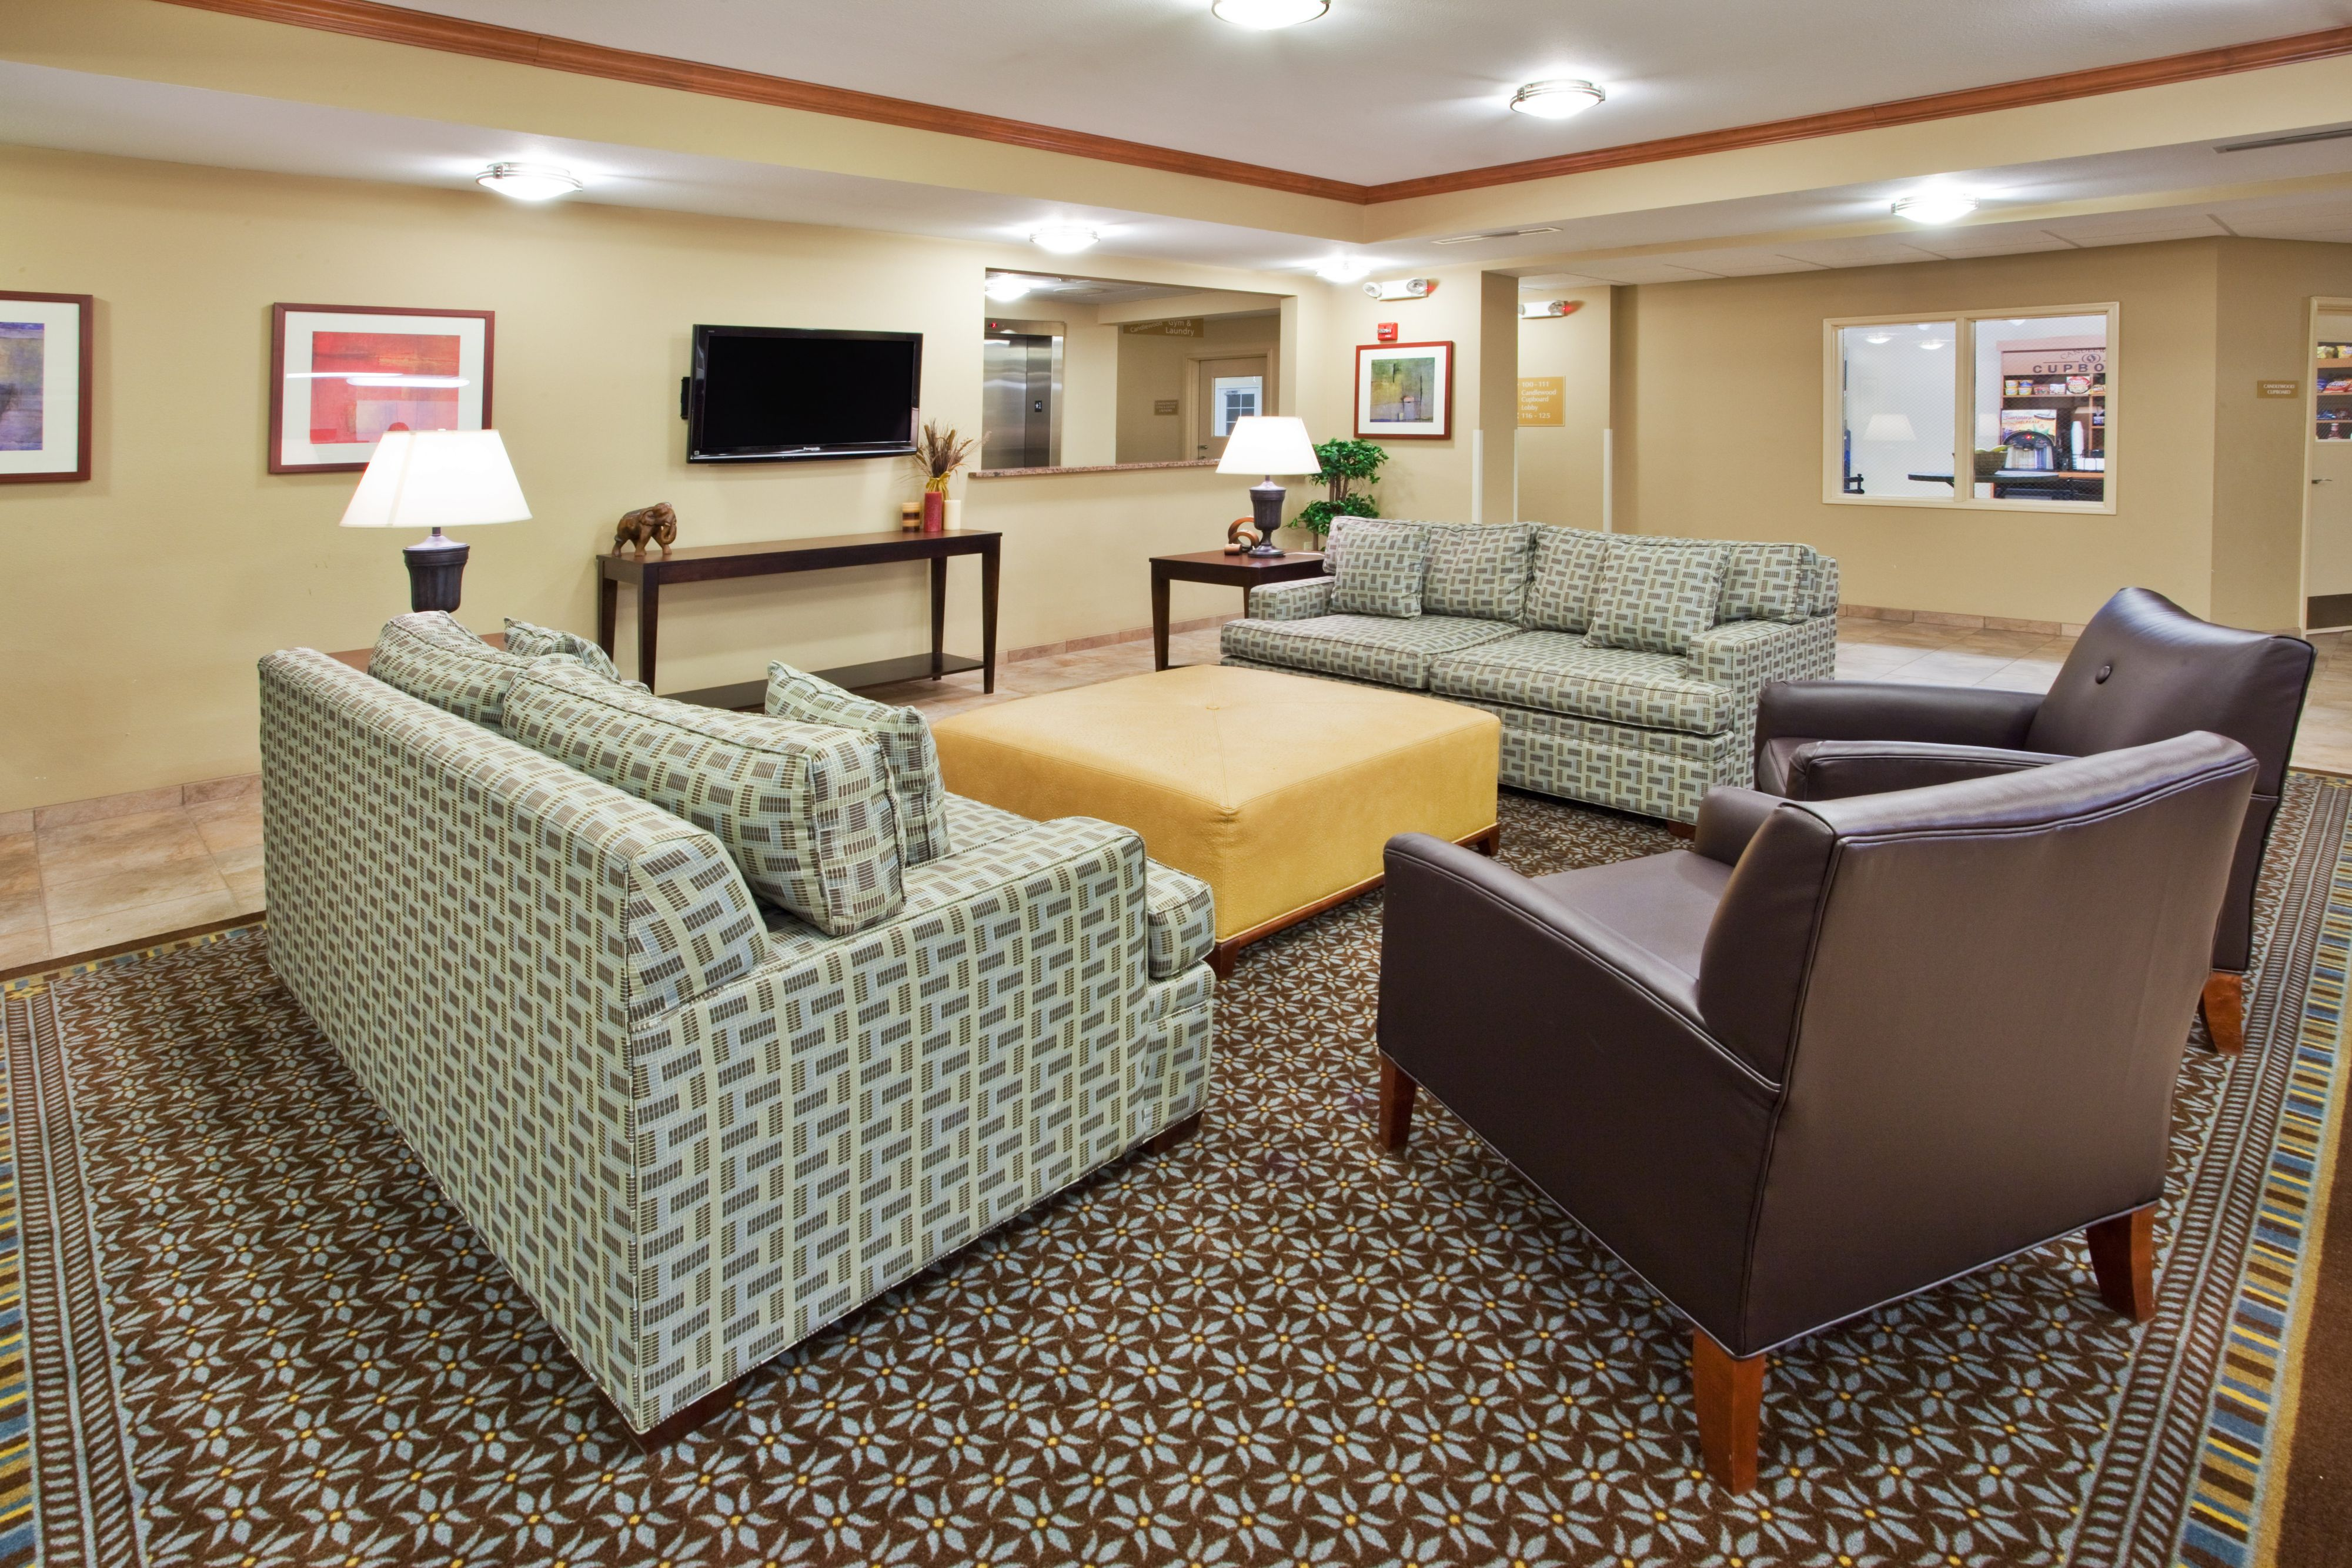 candlewood suites kalamazoo kalamazoo michigan mi. Black Bedroom Furniture Sets. Home Design Ideas